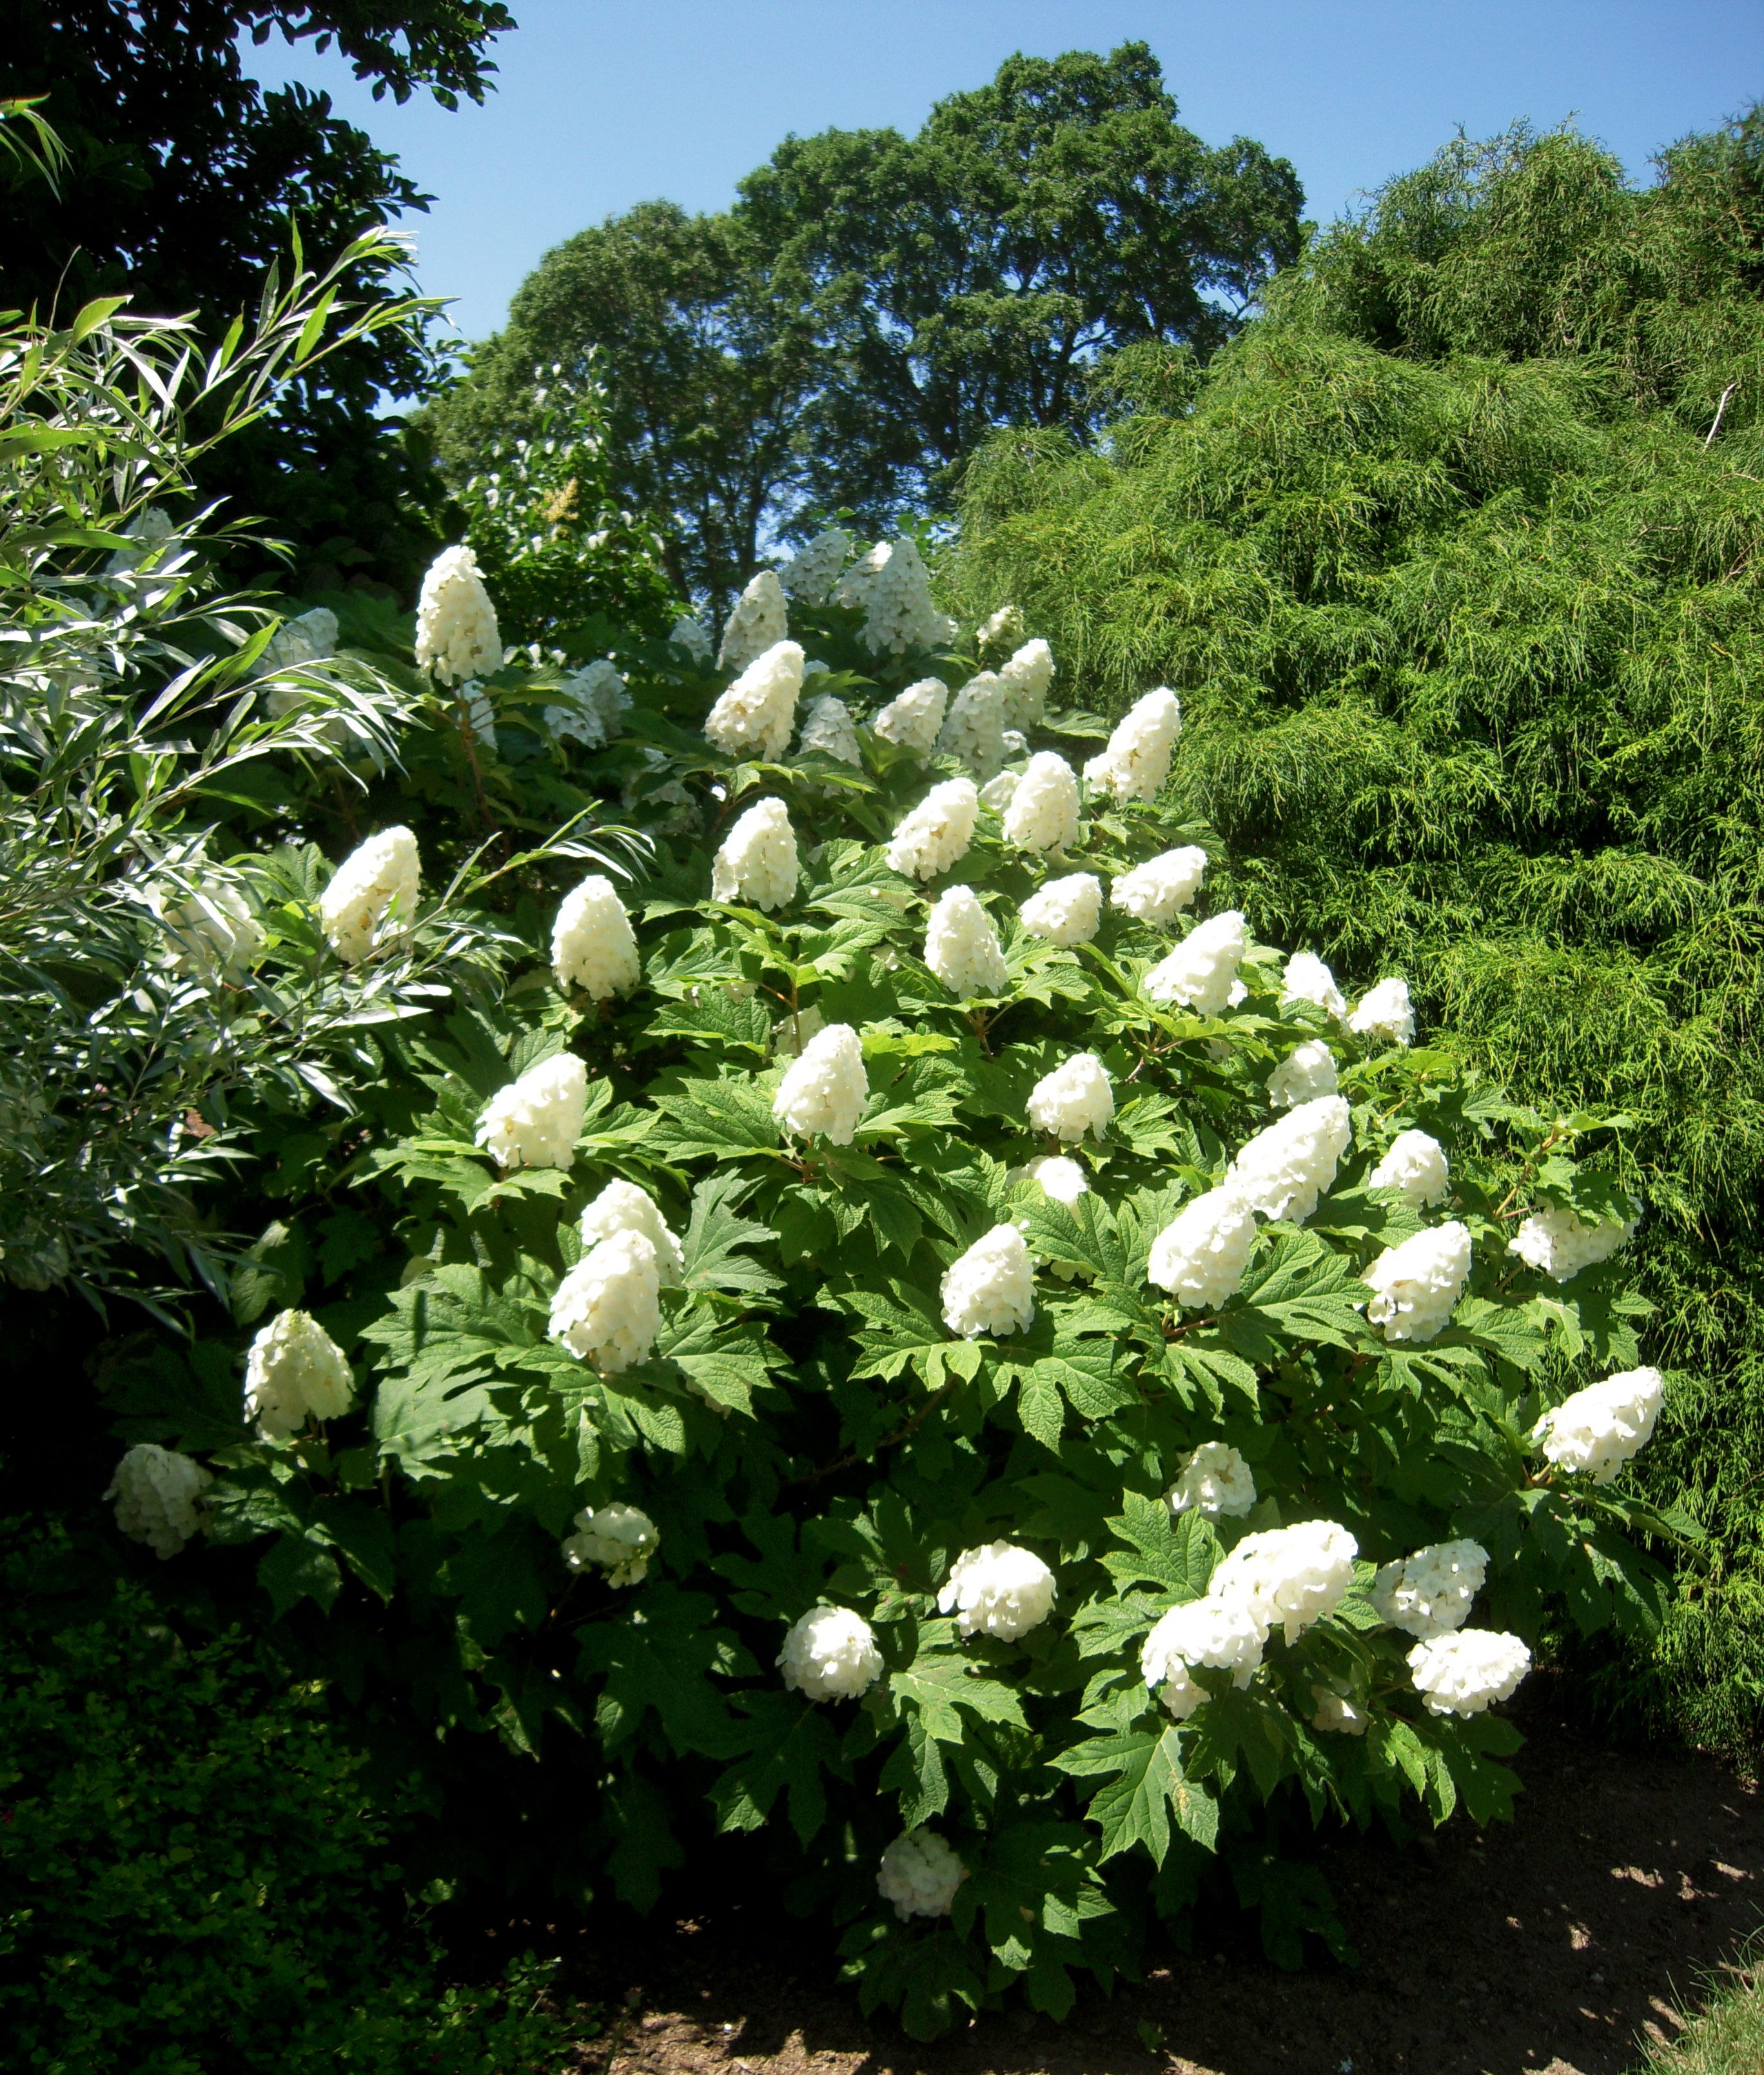 Oakleaf hydrangea envy at white flower farm in litchfield ct oakleaf hydrangea envy at white flower farm in litchfield ct mightylinksfo